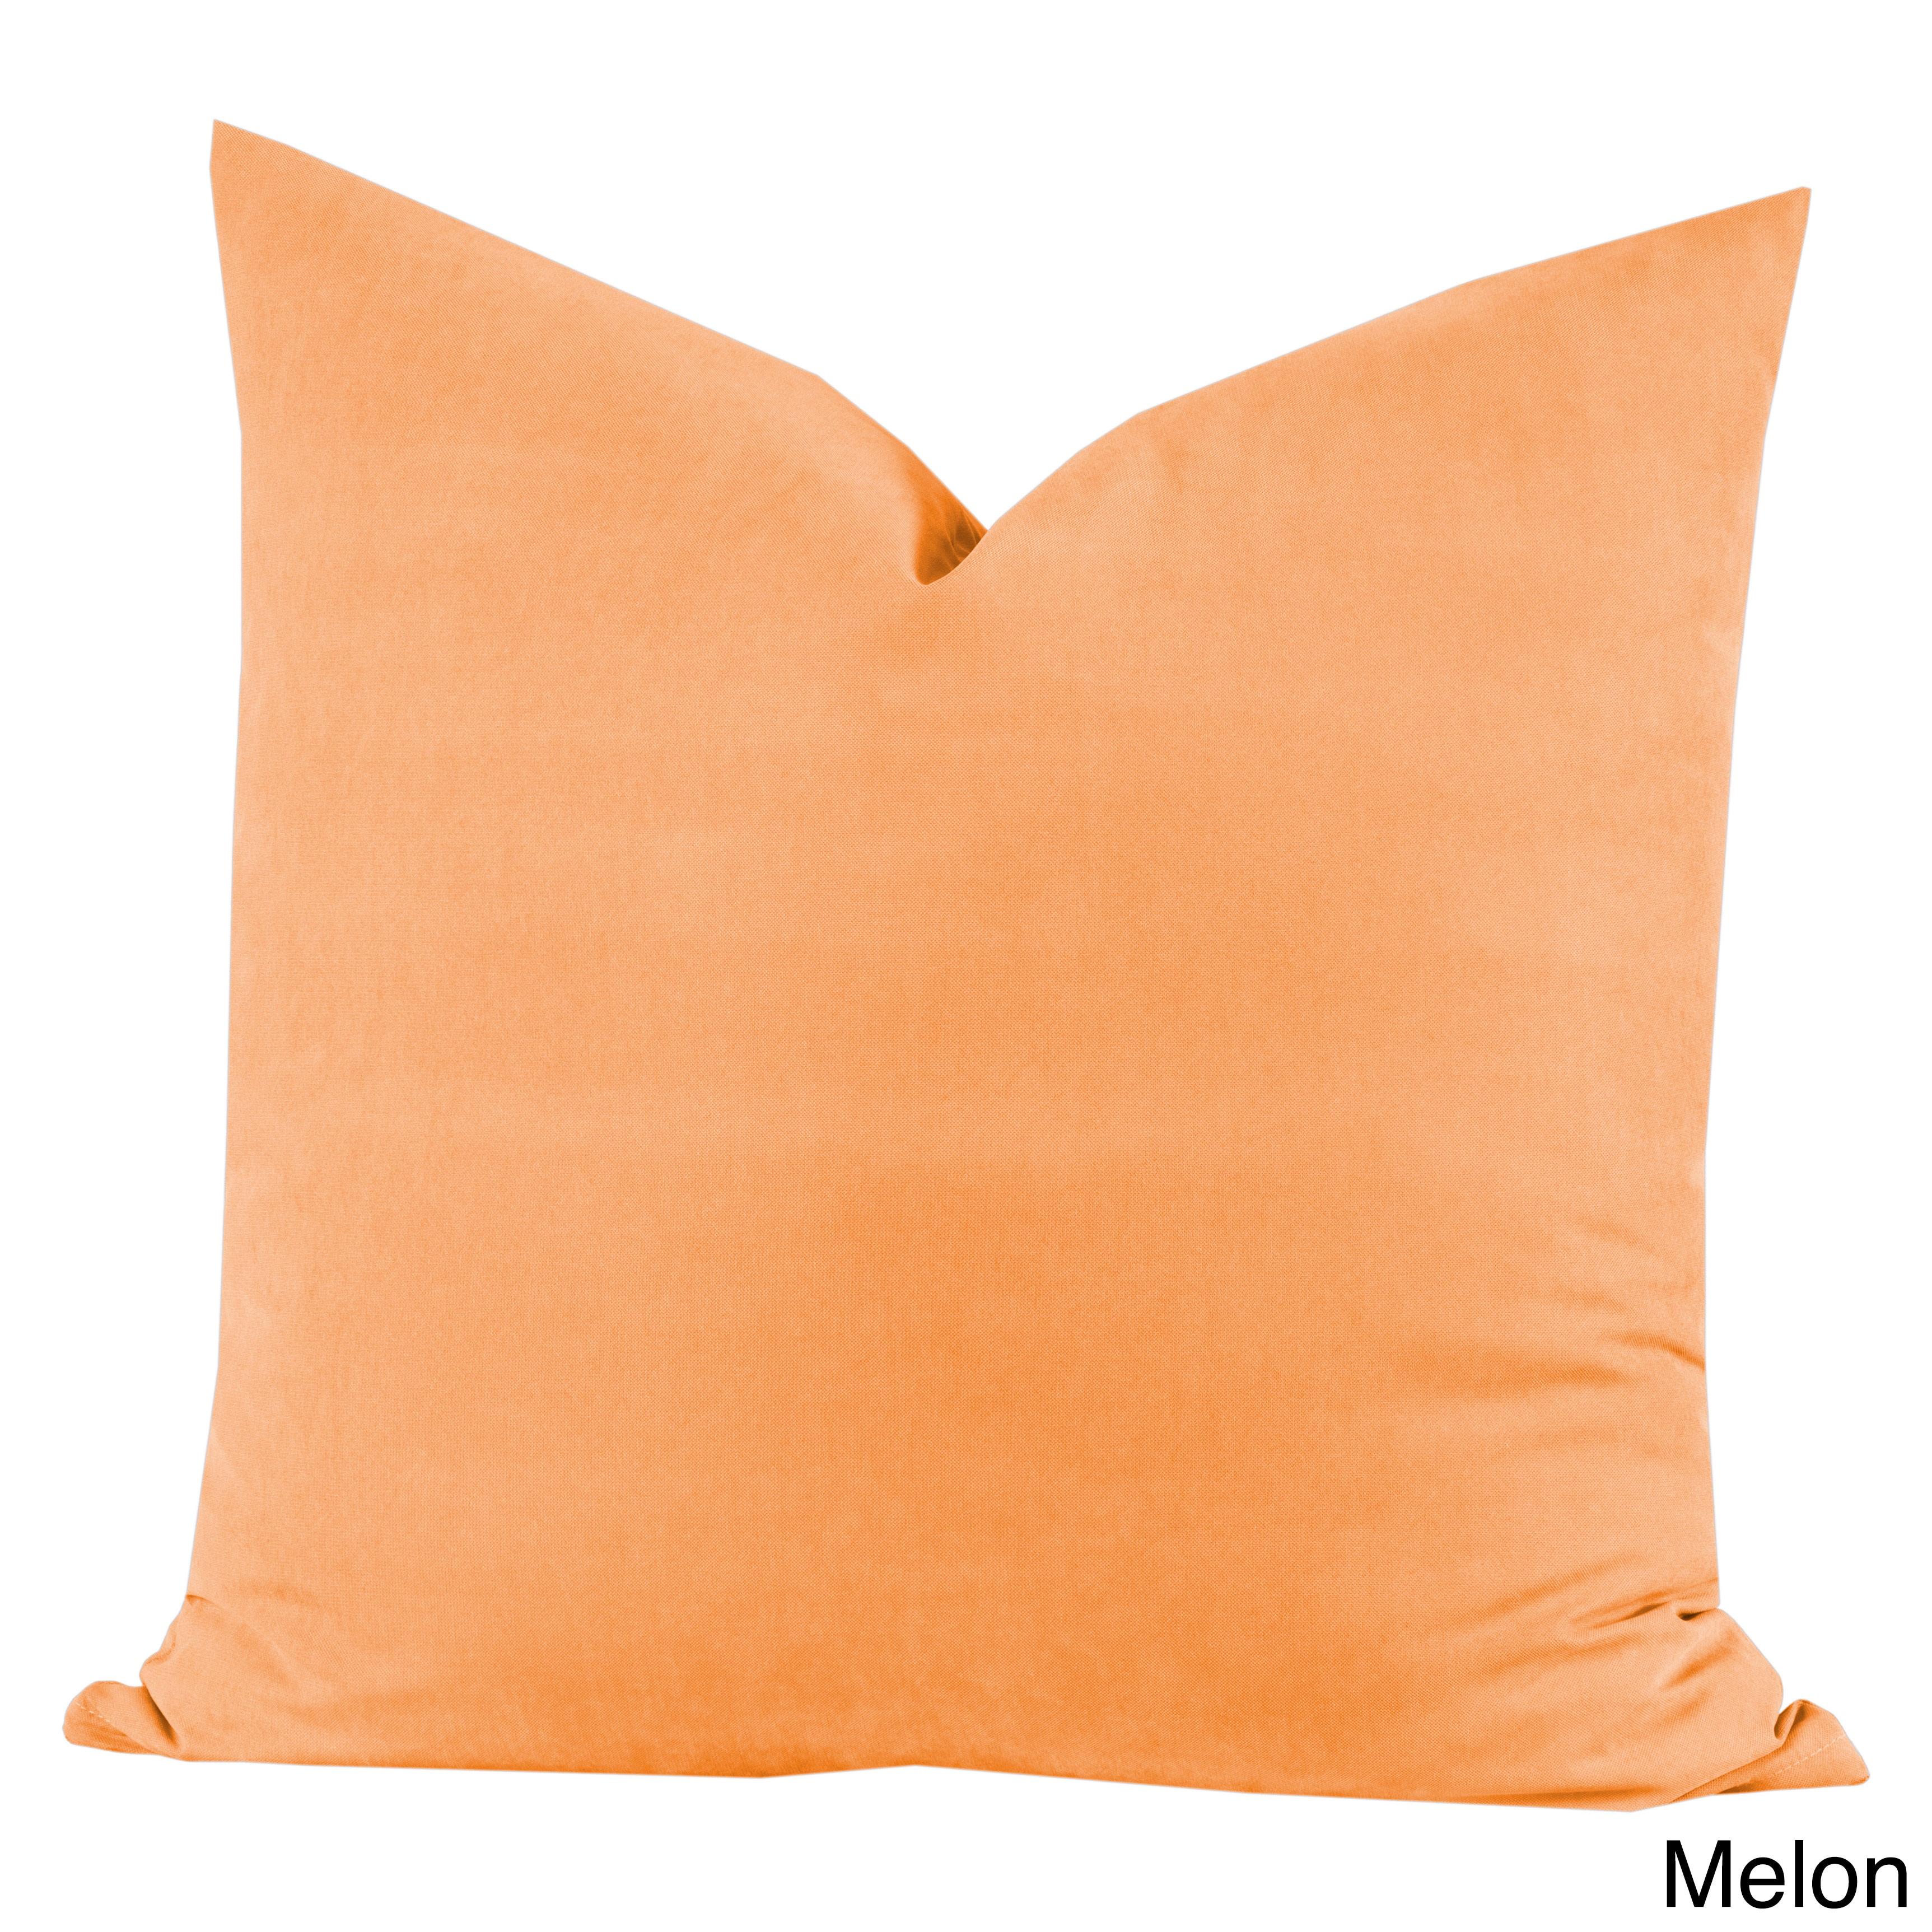 classic lumbar design yel pucci braniff orange pillow and bi itm vivara collection